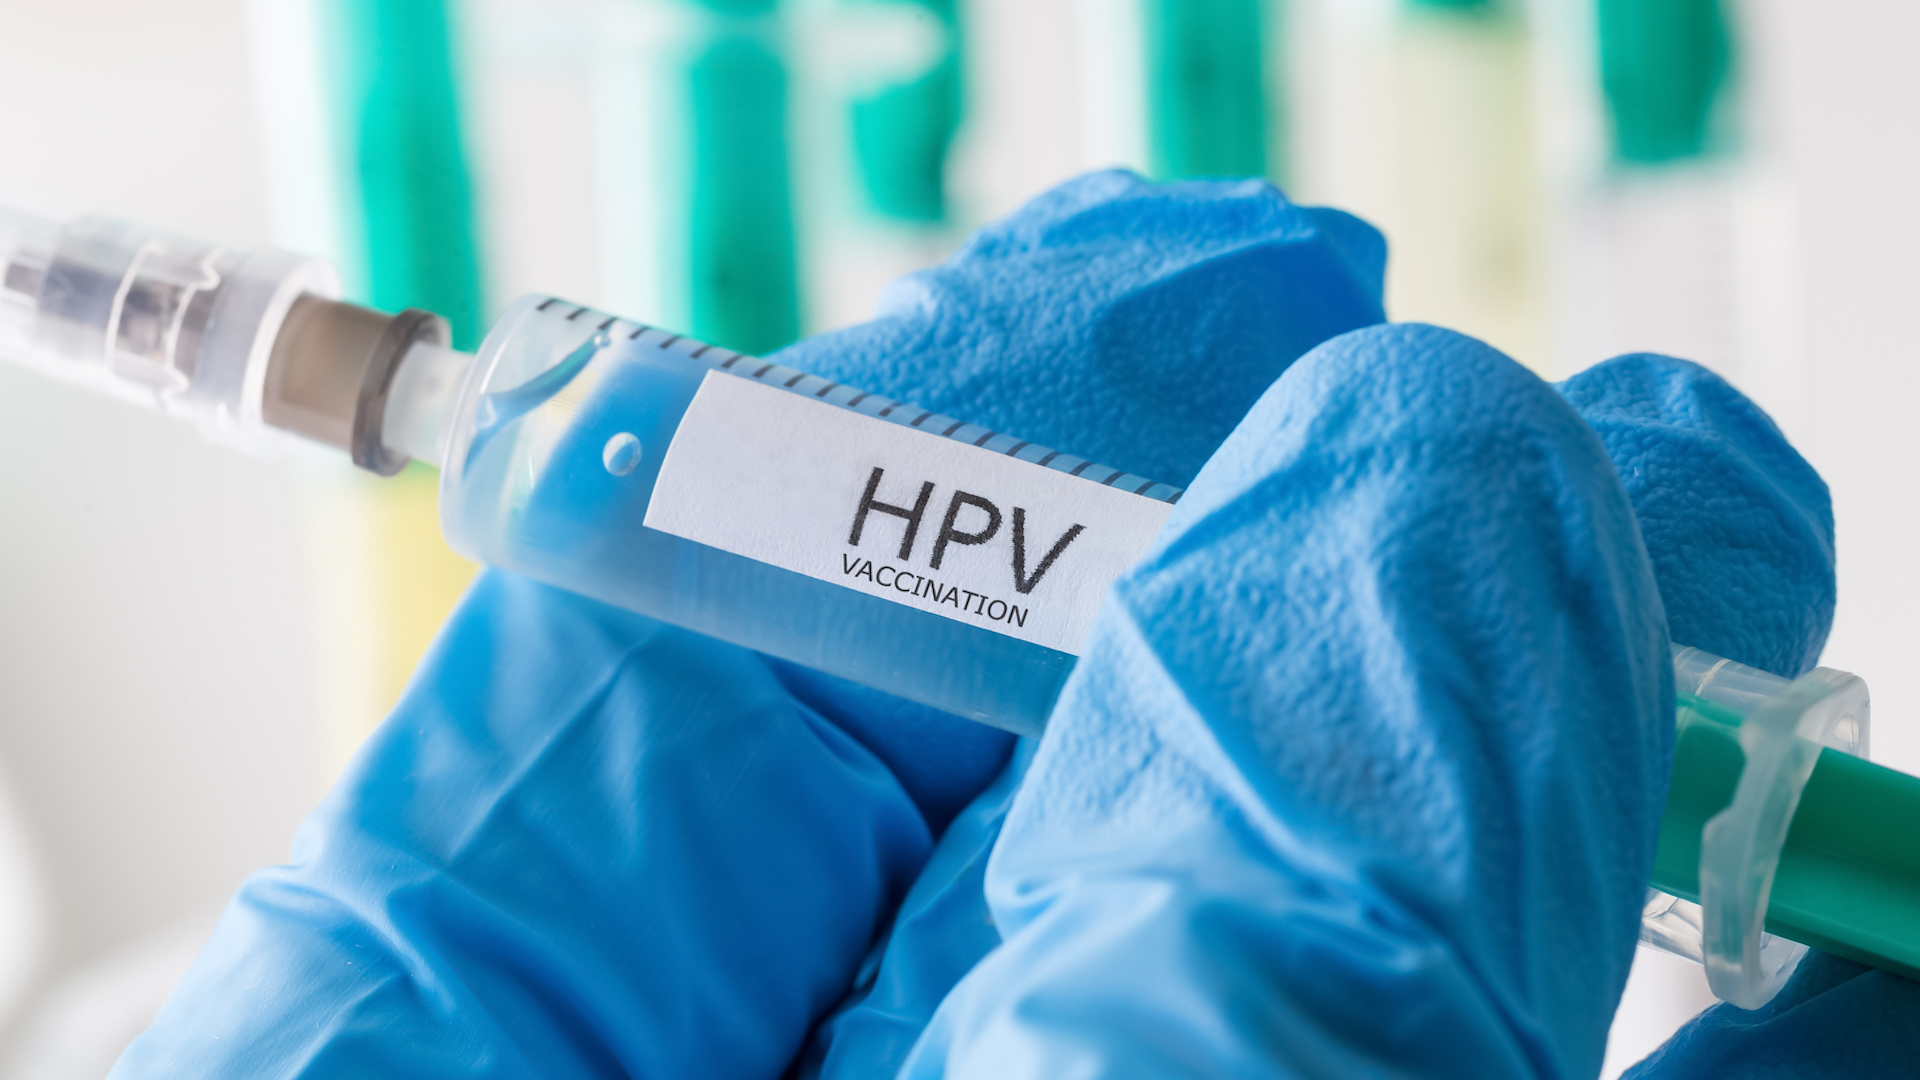 papilloma virus e infertilita maschile hpv vaccine gp